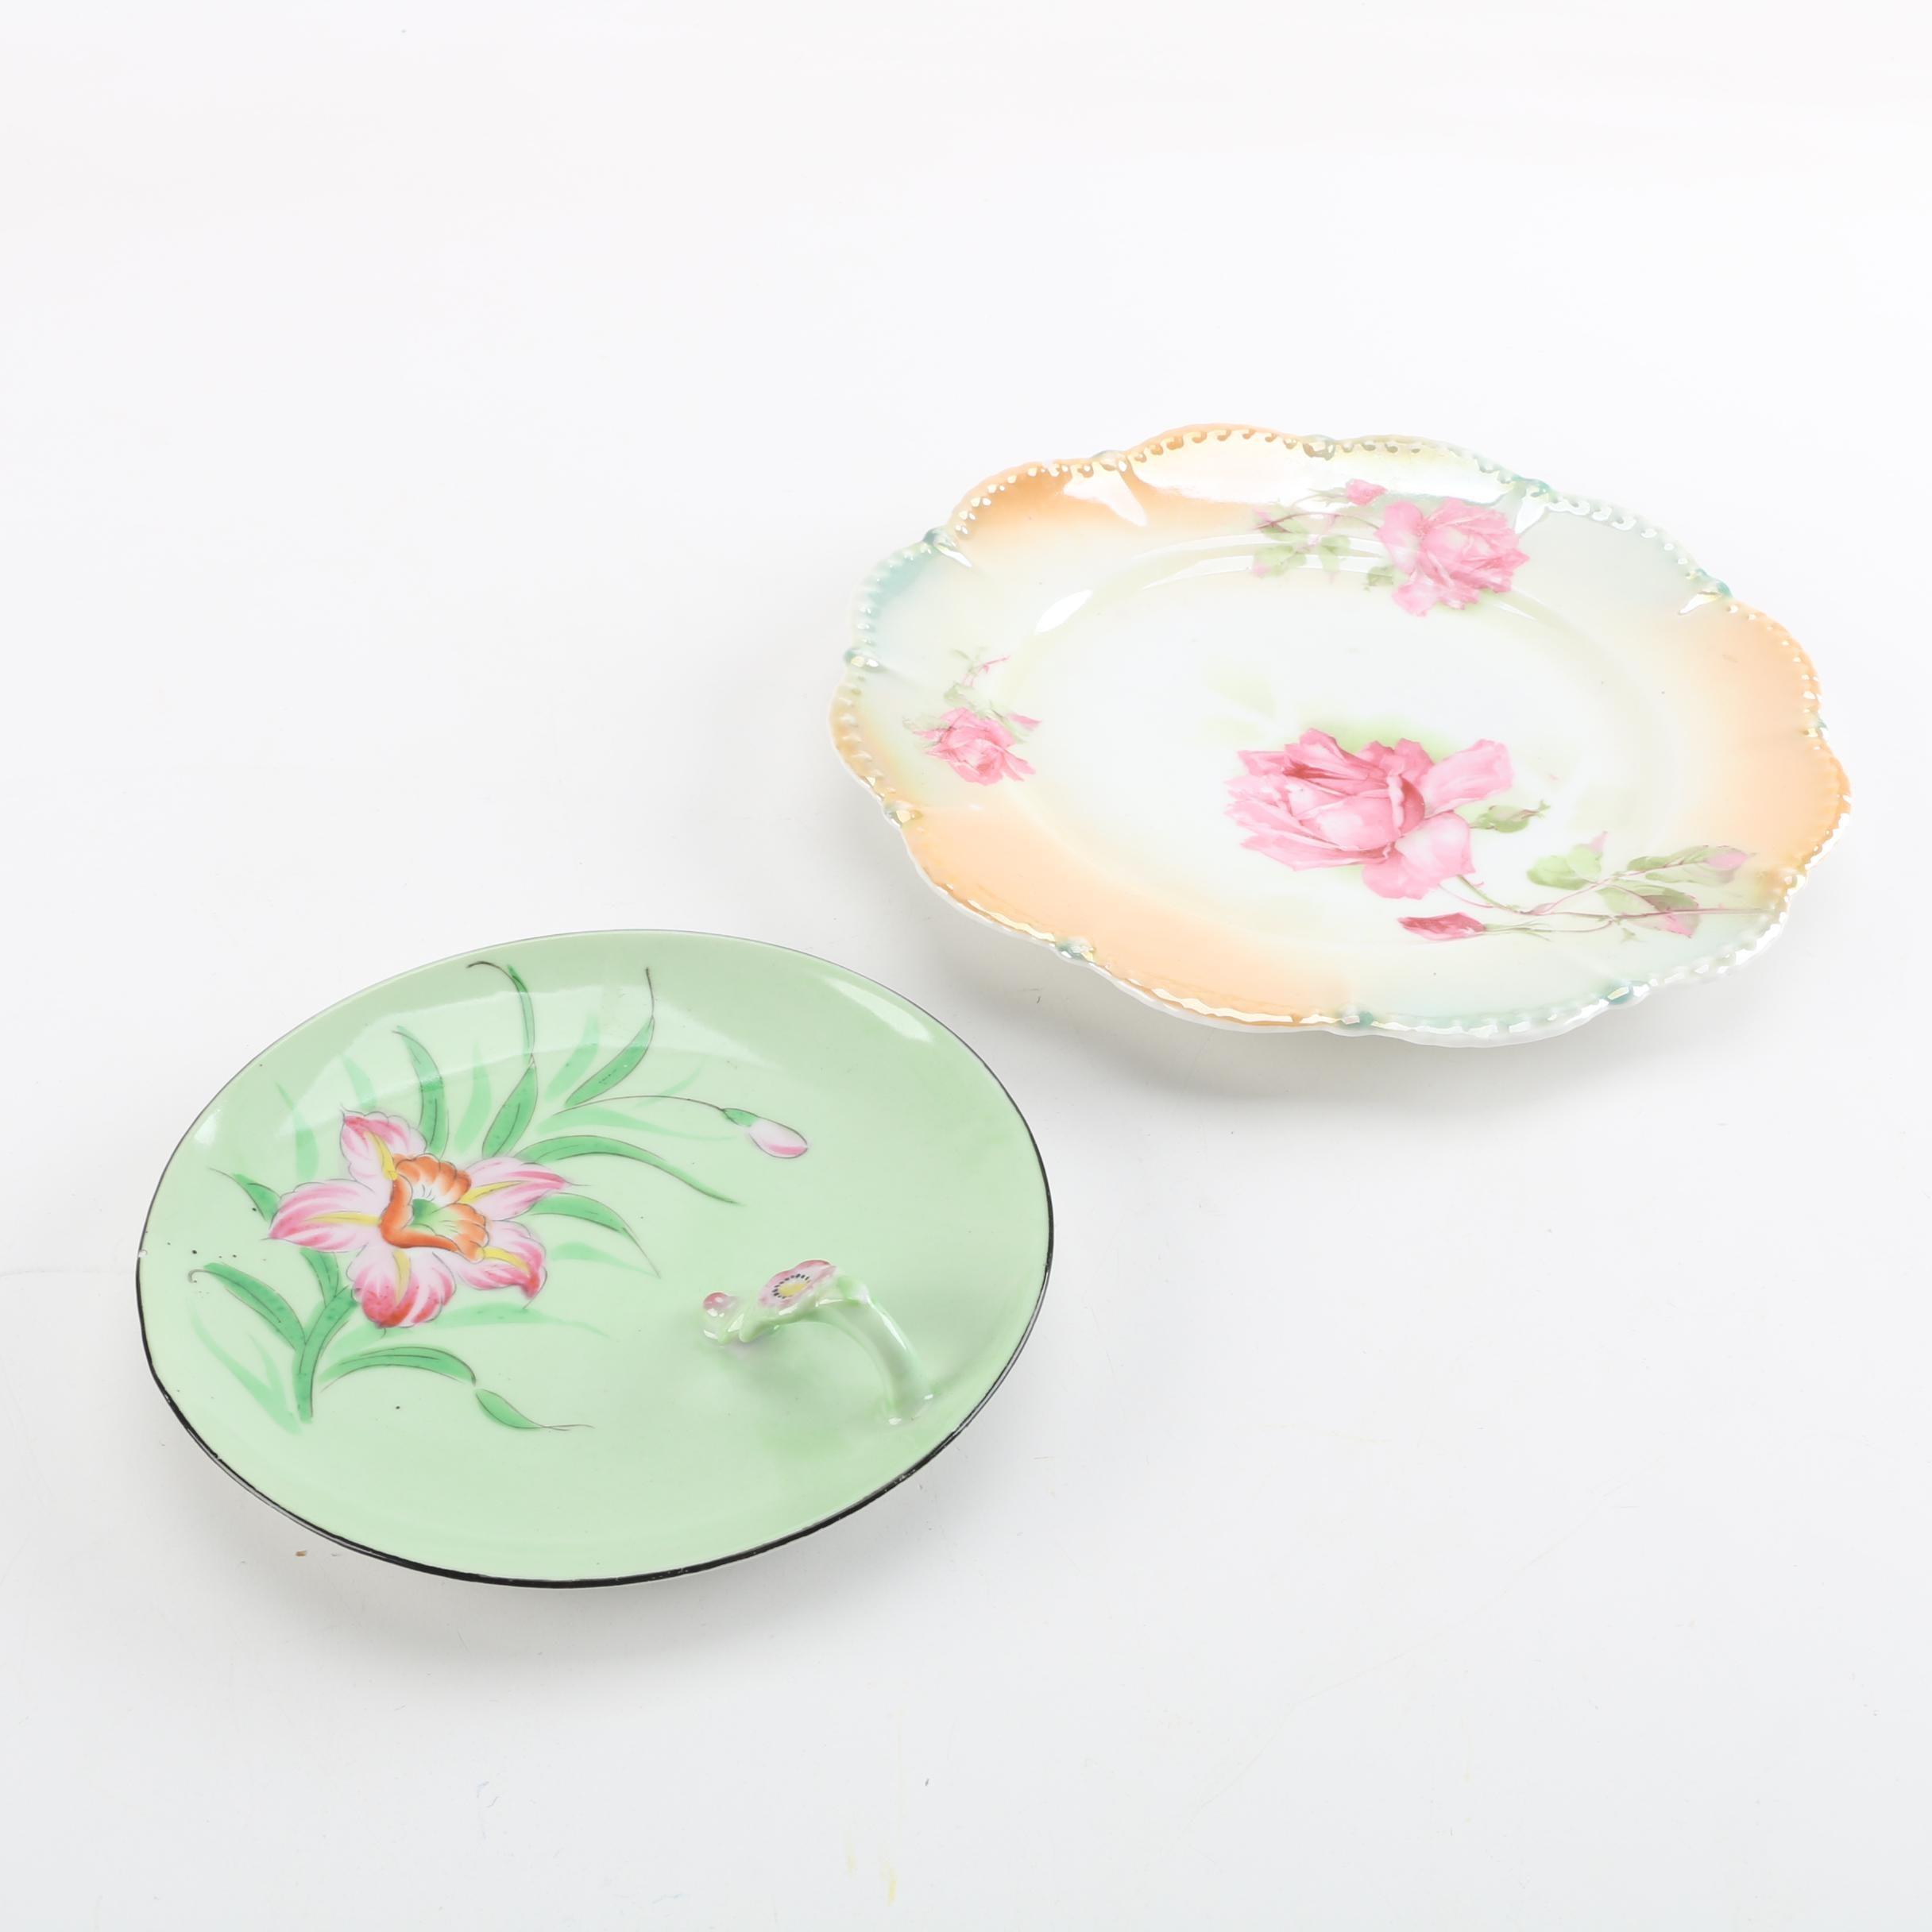 Vintage Floral Porcelain Plates